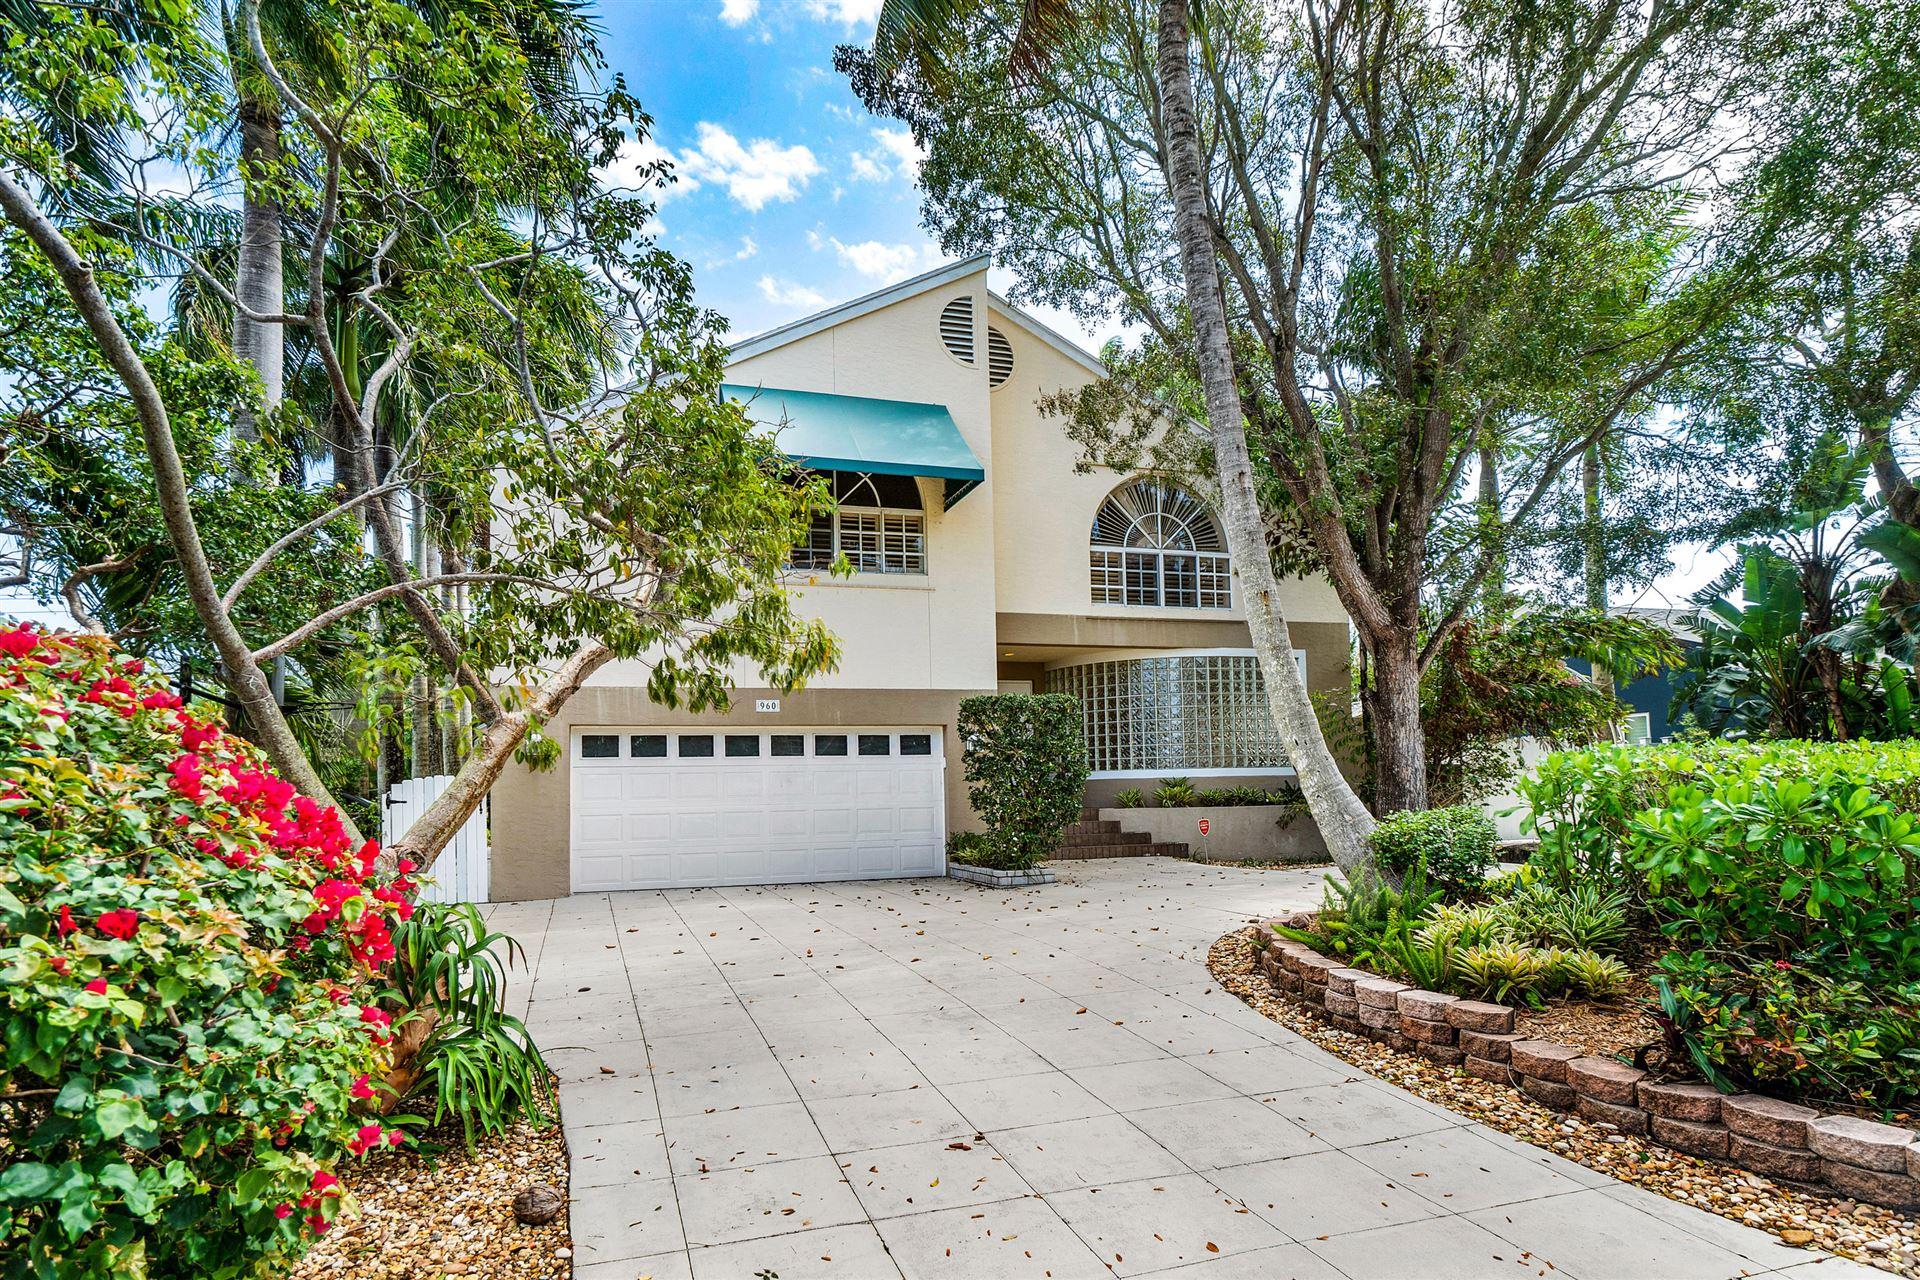 960 NW 4th Court, Boca Raton, FL 33432 - MLS#: RX-10695072